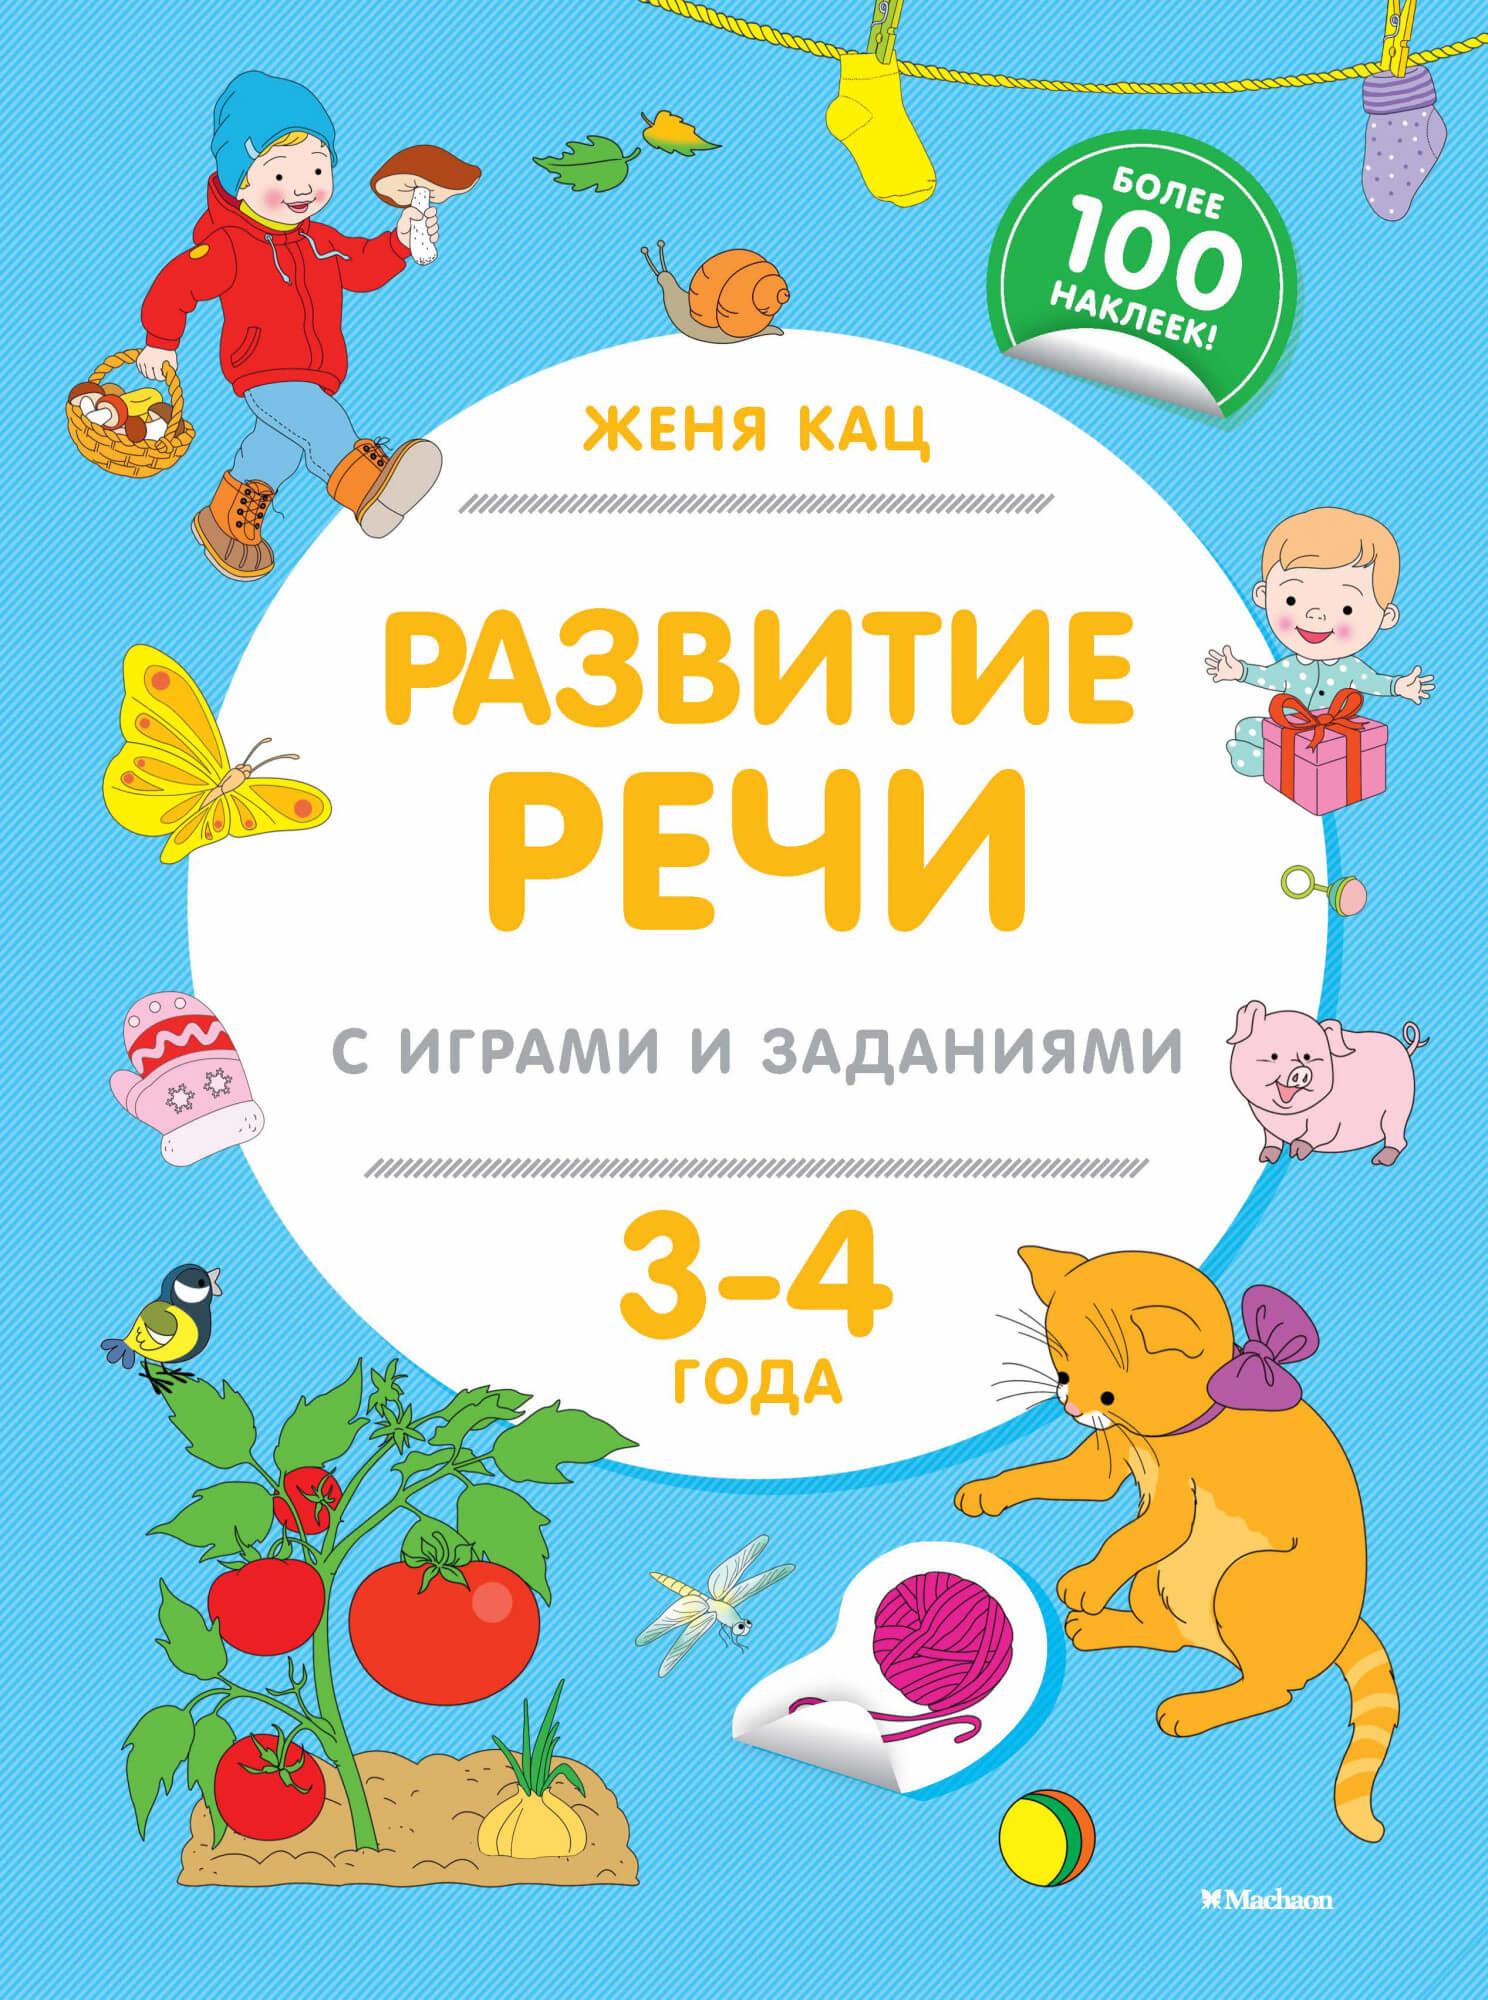 Развитие речи с играми и заданиями ( 3-4 года )